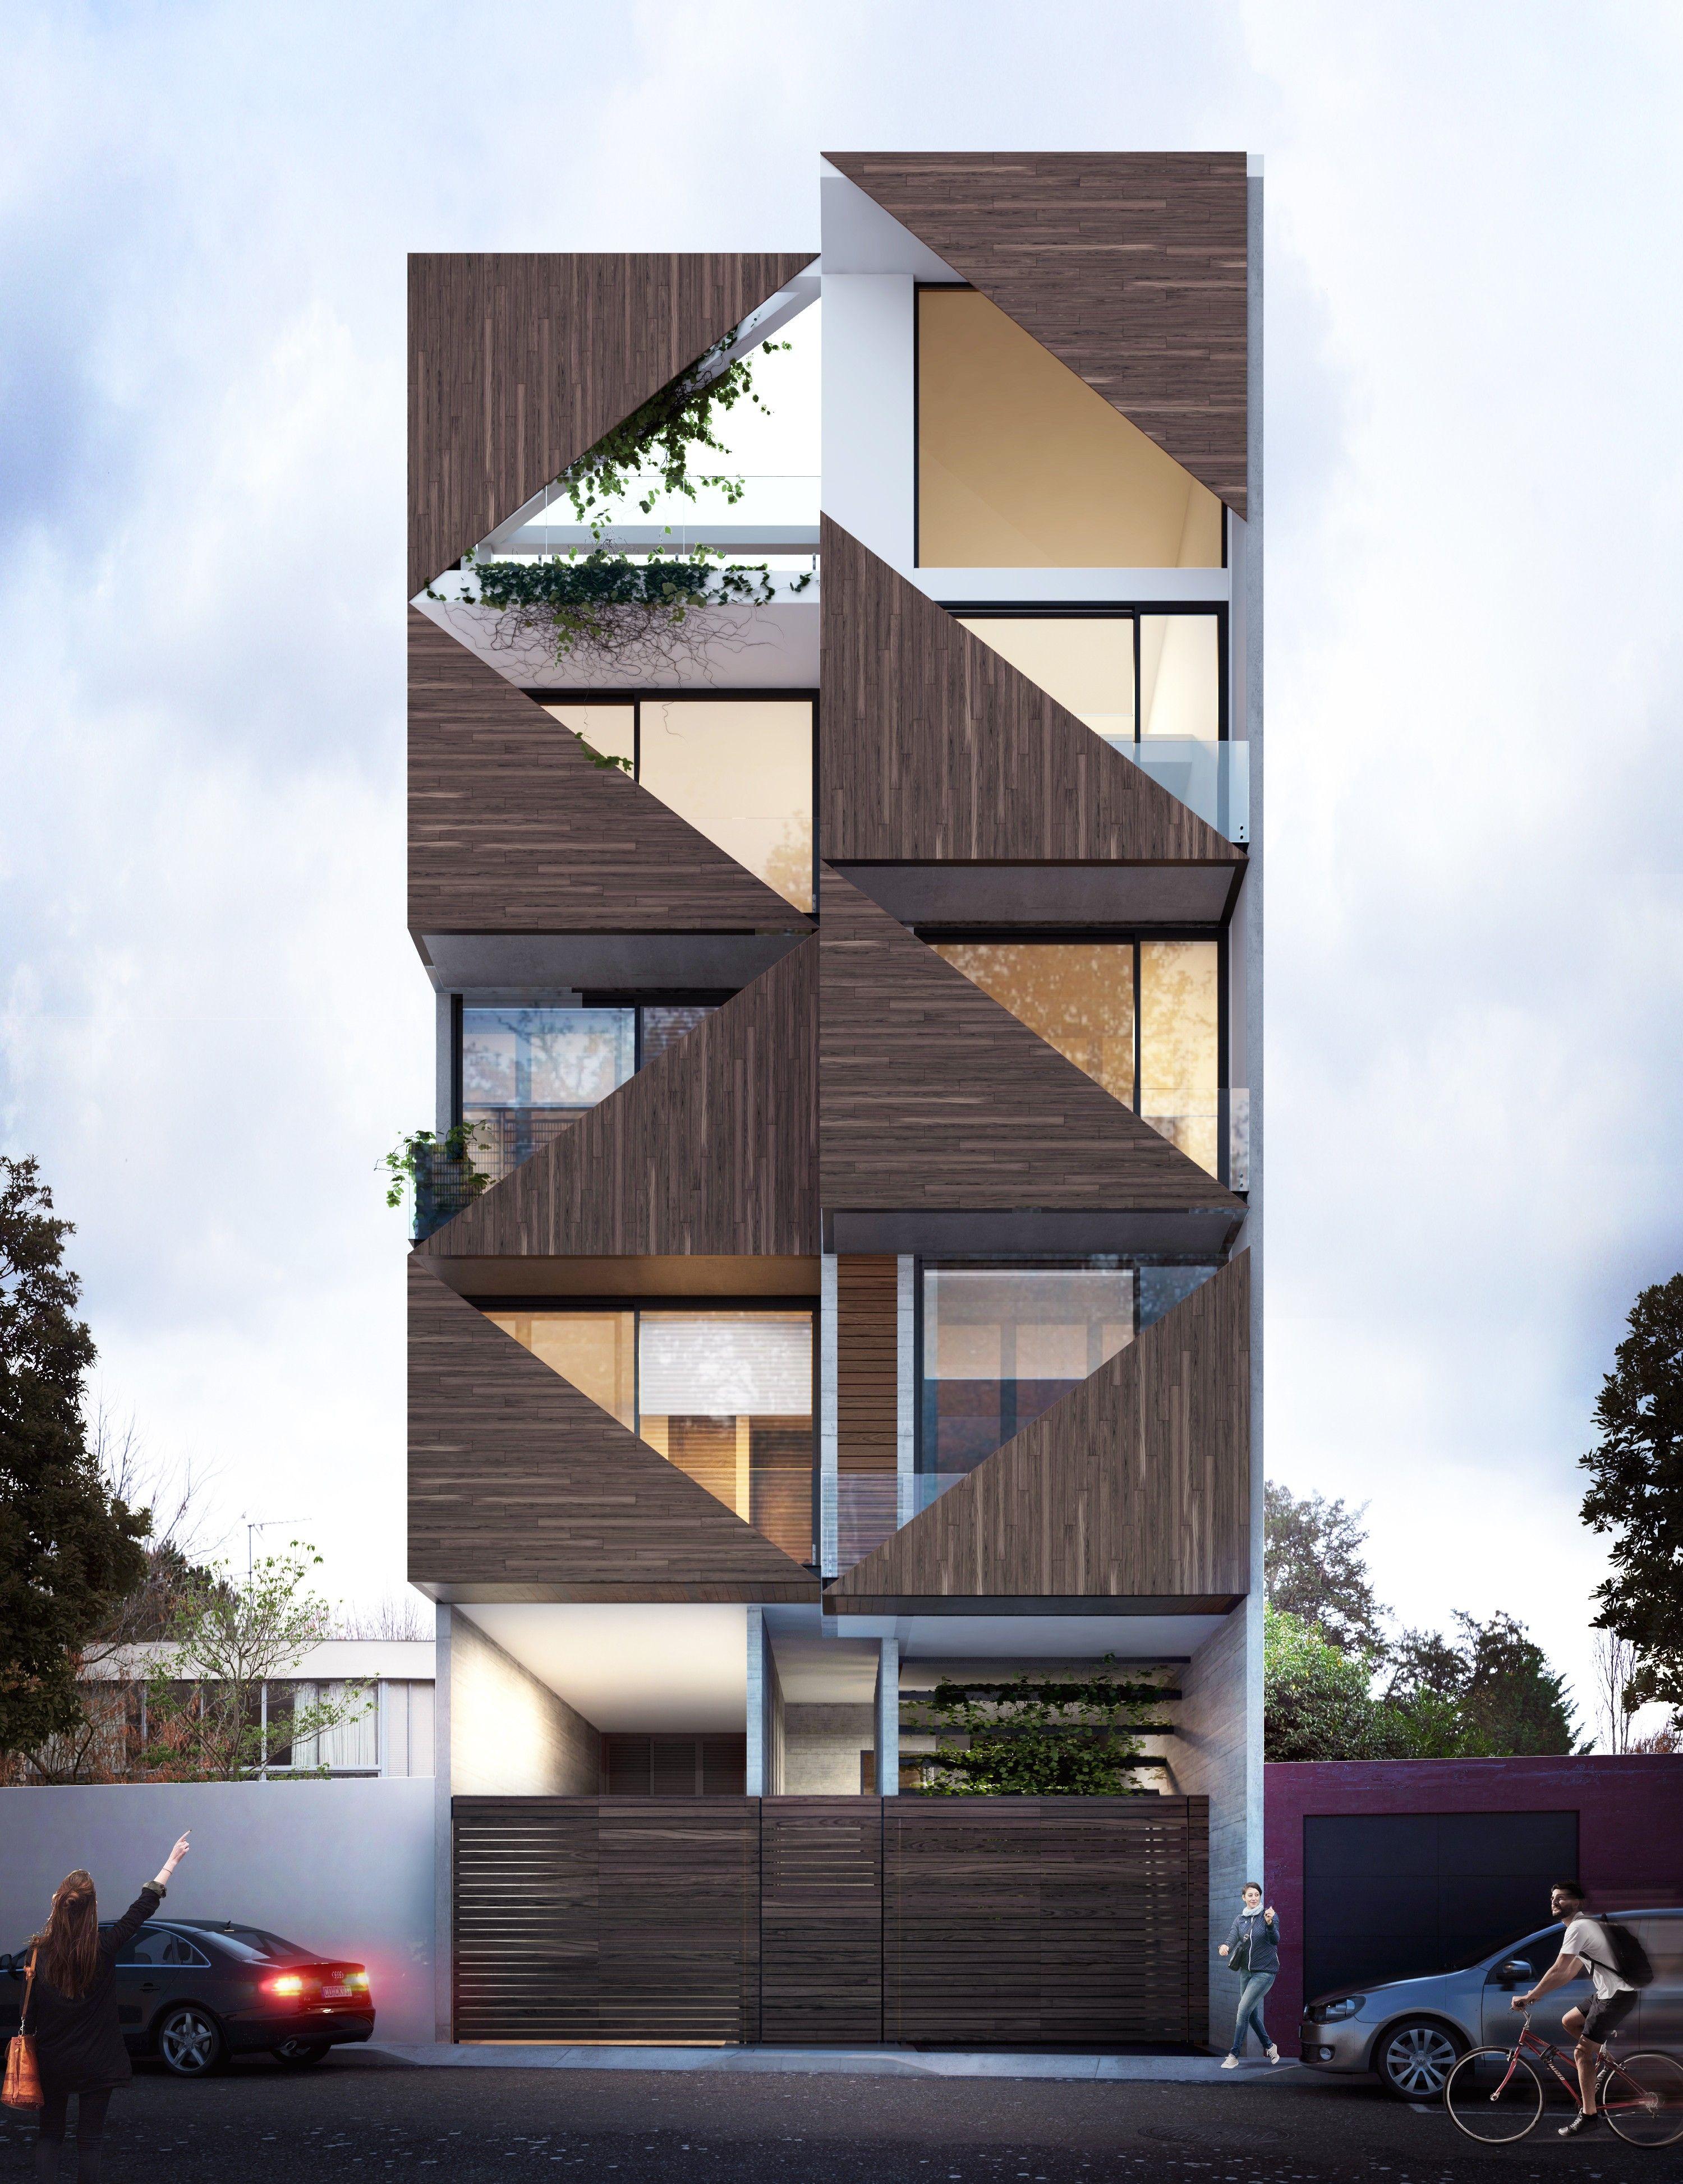 Xoco 27 by aflo arquitectos 27w mexico arquitectura for Arquitectos mexicanos